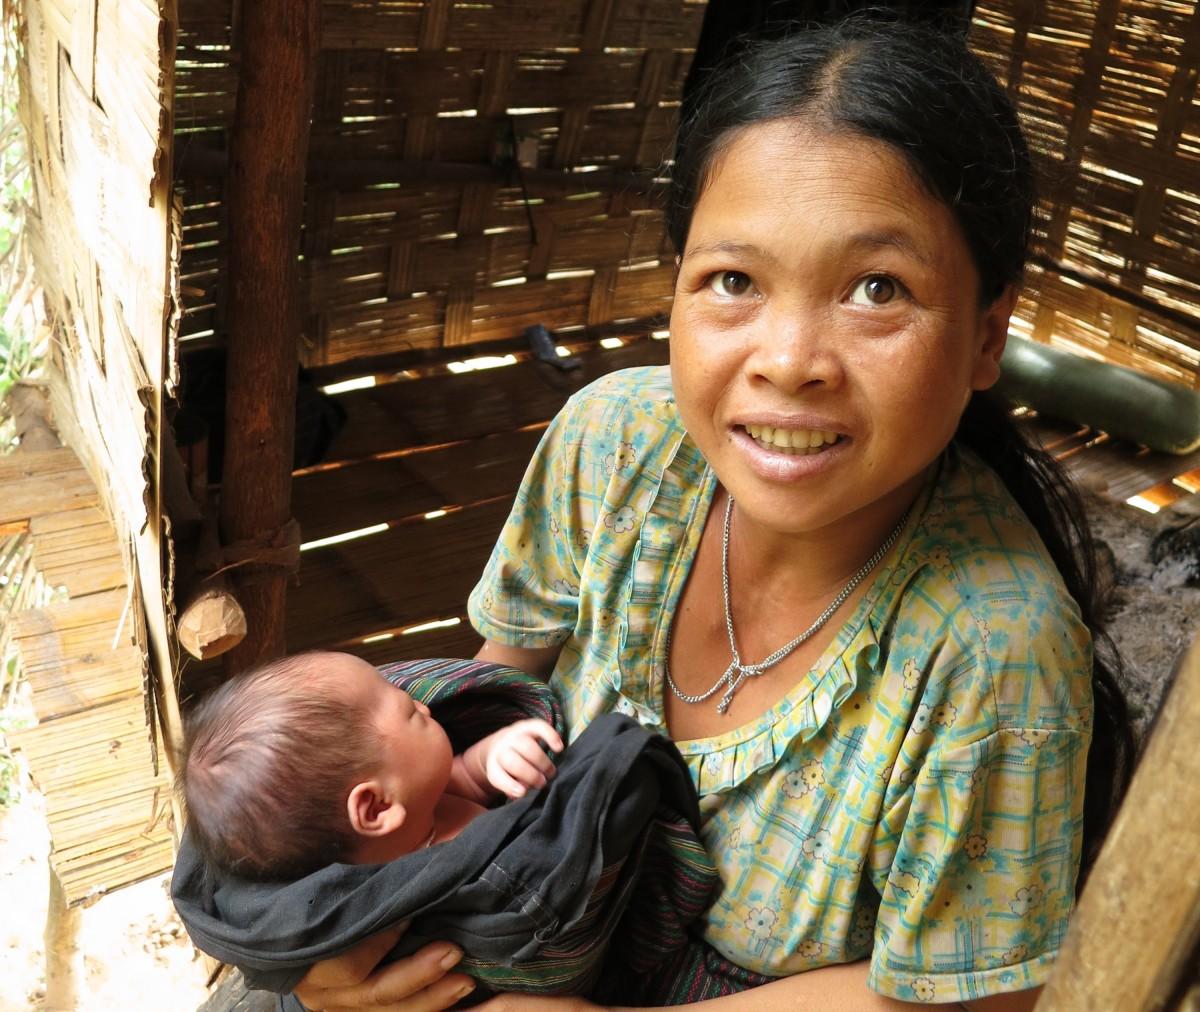 Photo Credit: CleanBirth.org